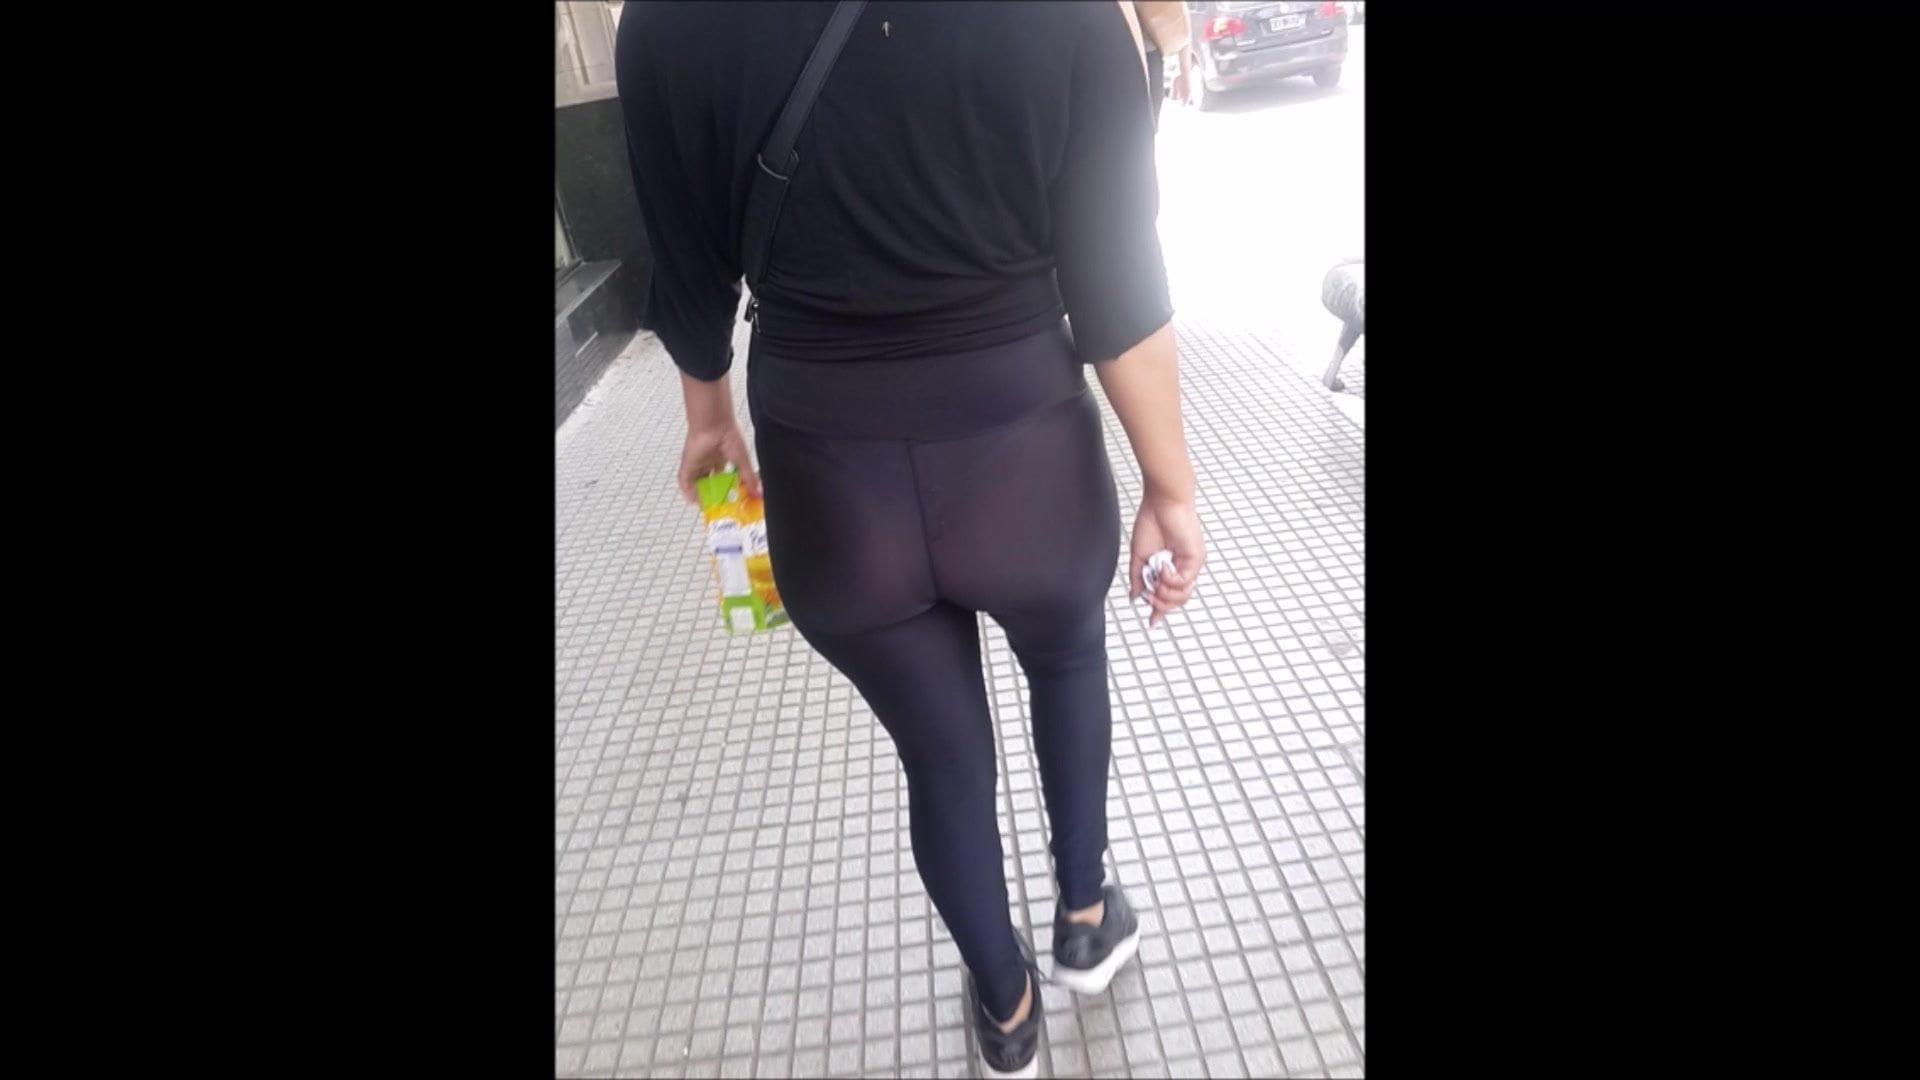 Metro argentina upskirt debajo falda sin ropa interior calzon piernas